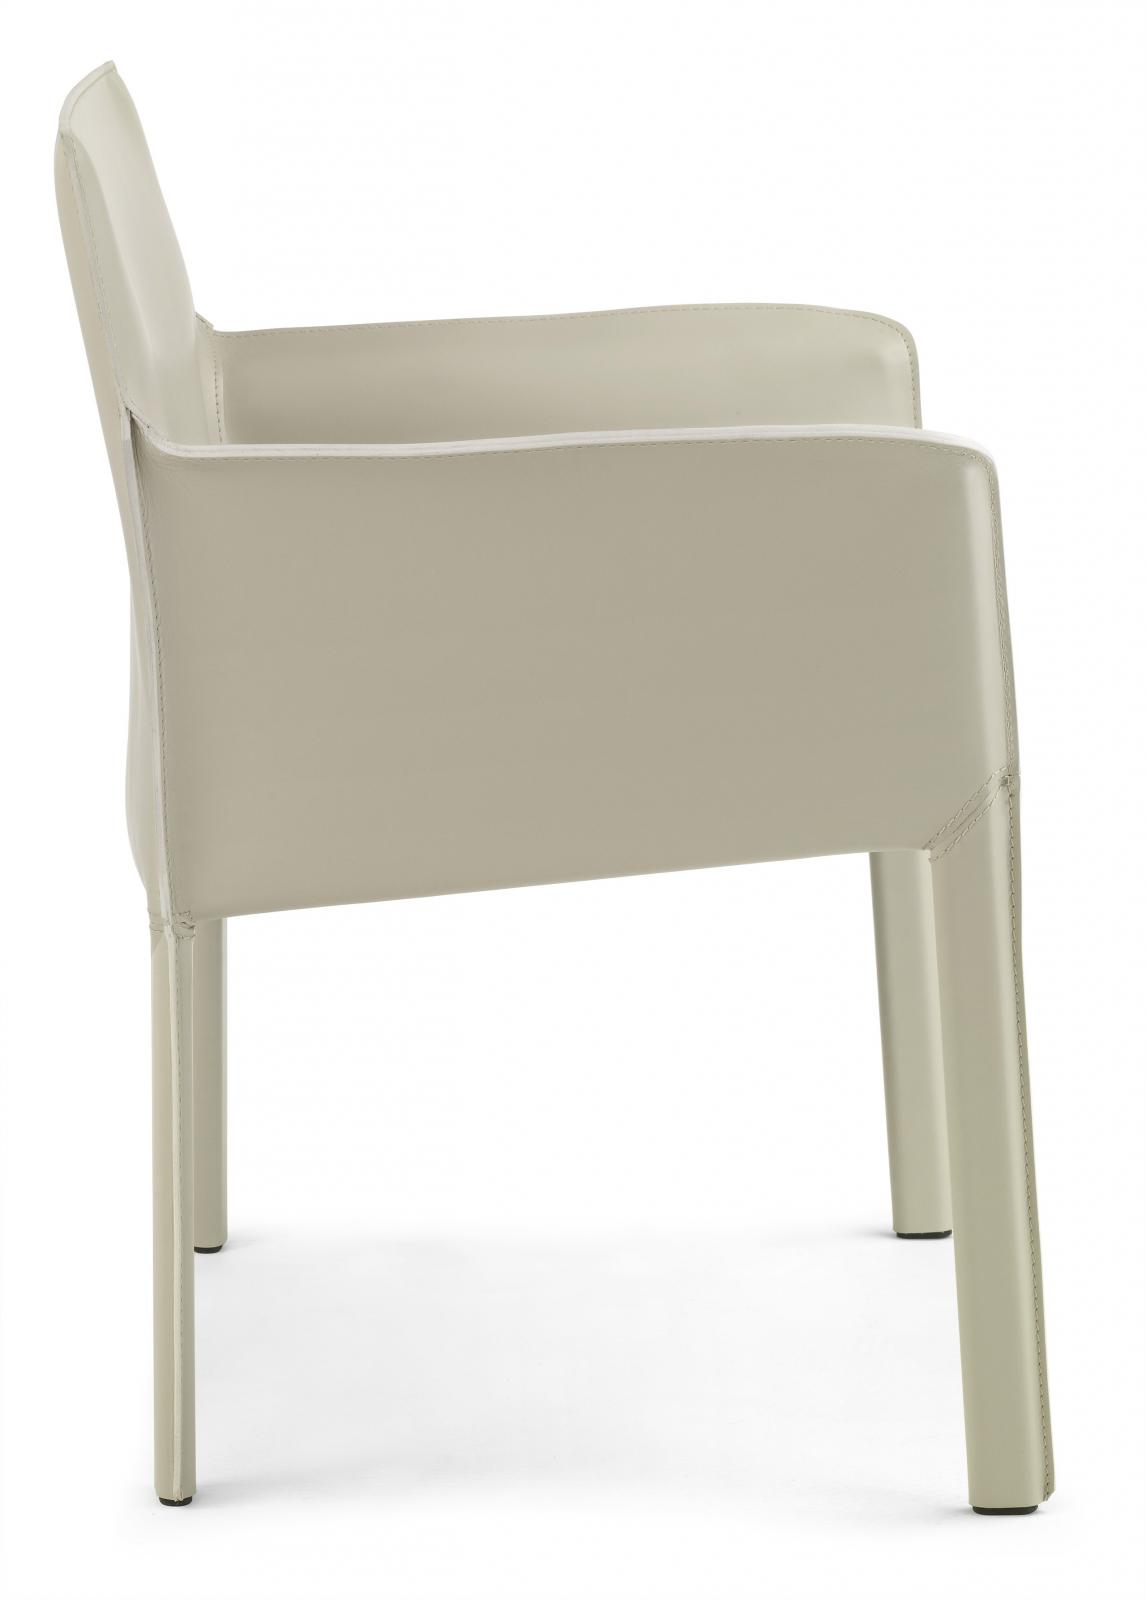 MDC 116 Modern Dining Chairs